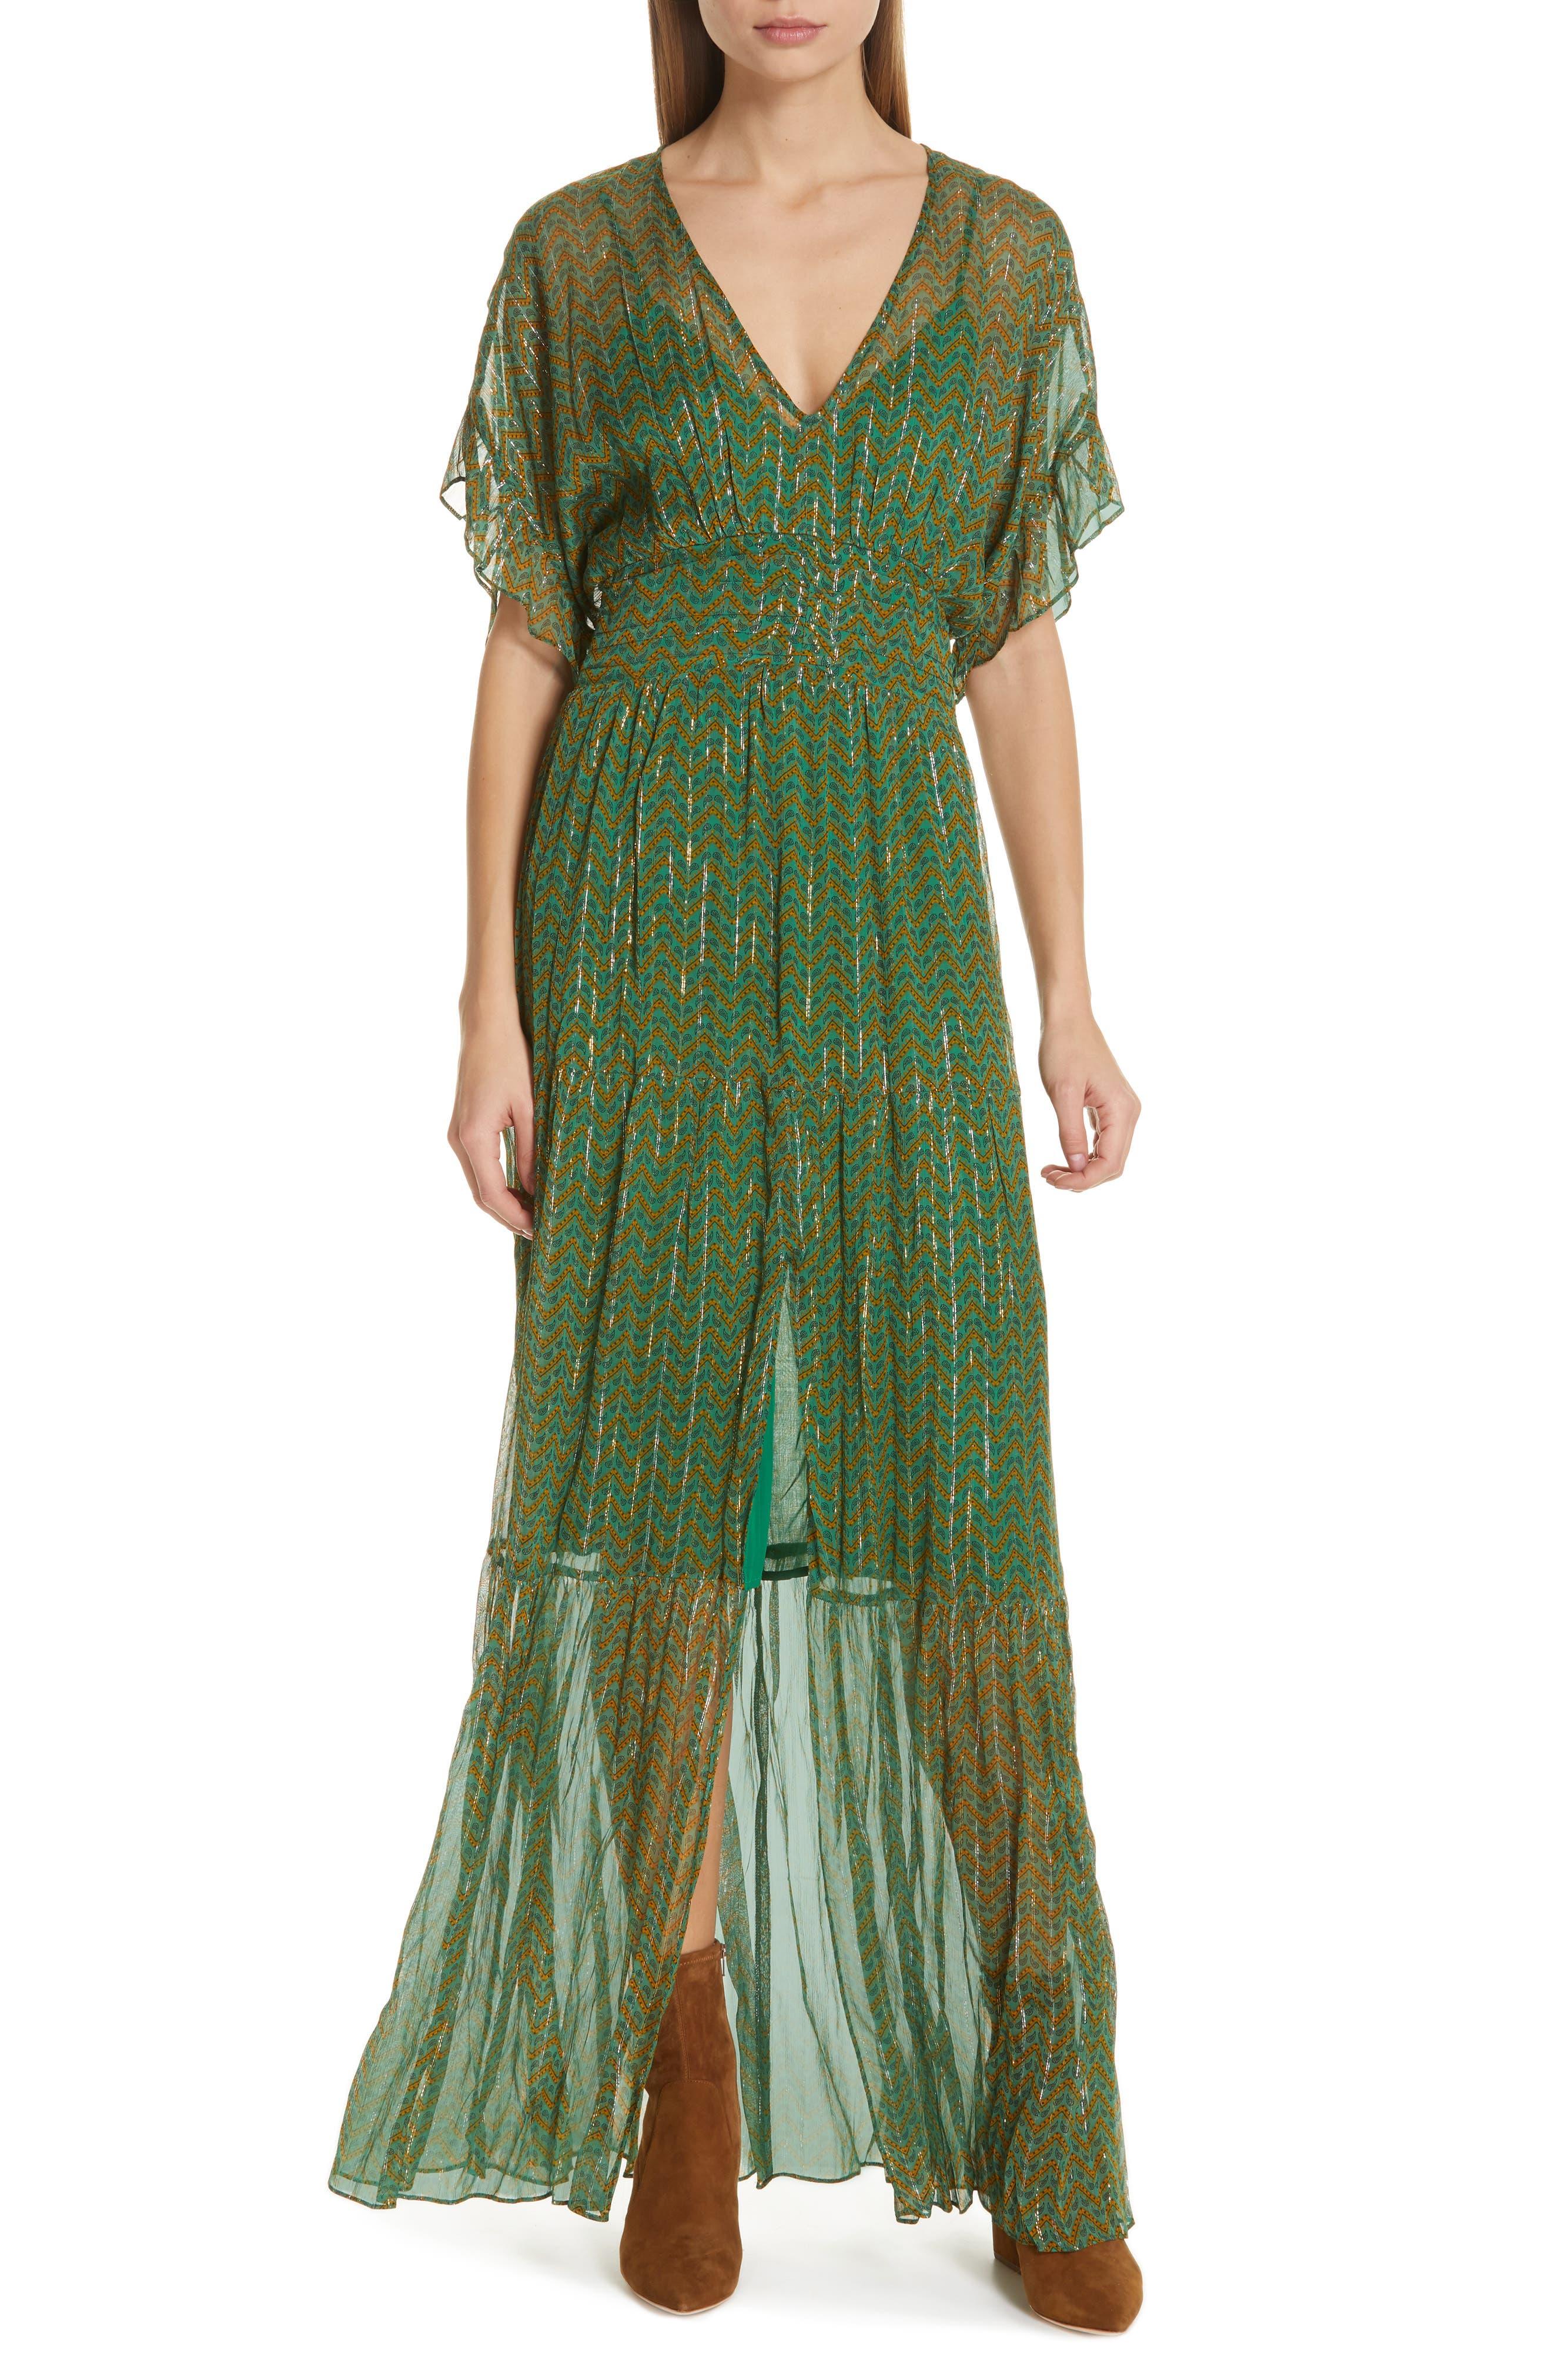 Ba & sh Wanda Metallic Accent Maxi Dress, Green